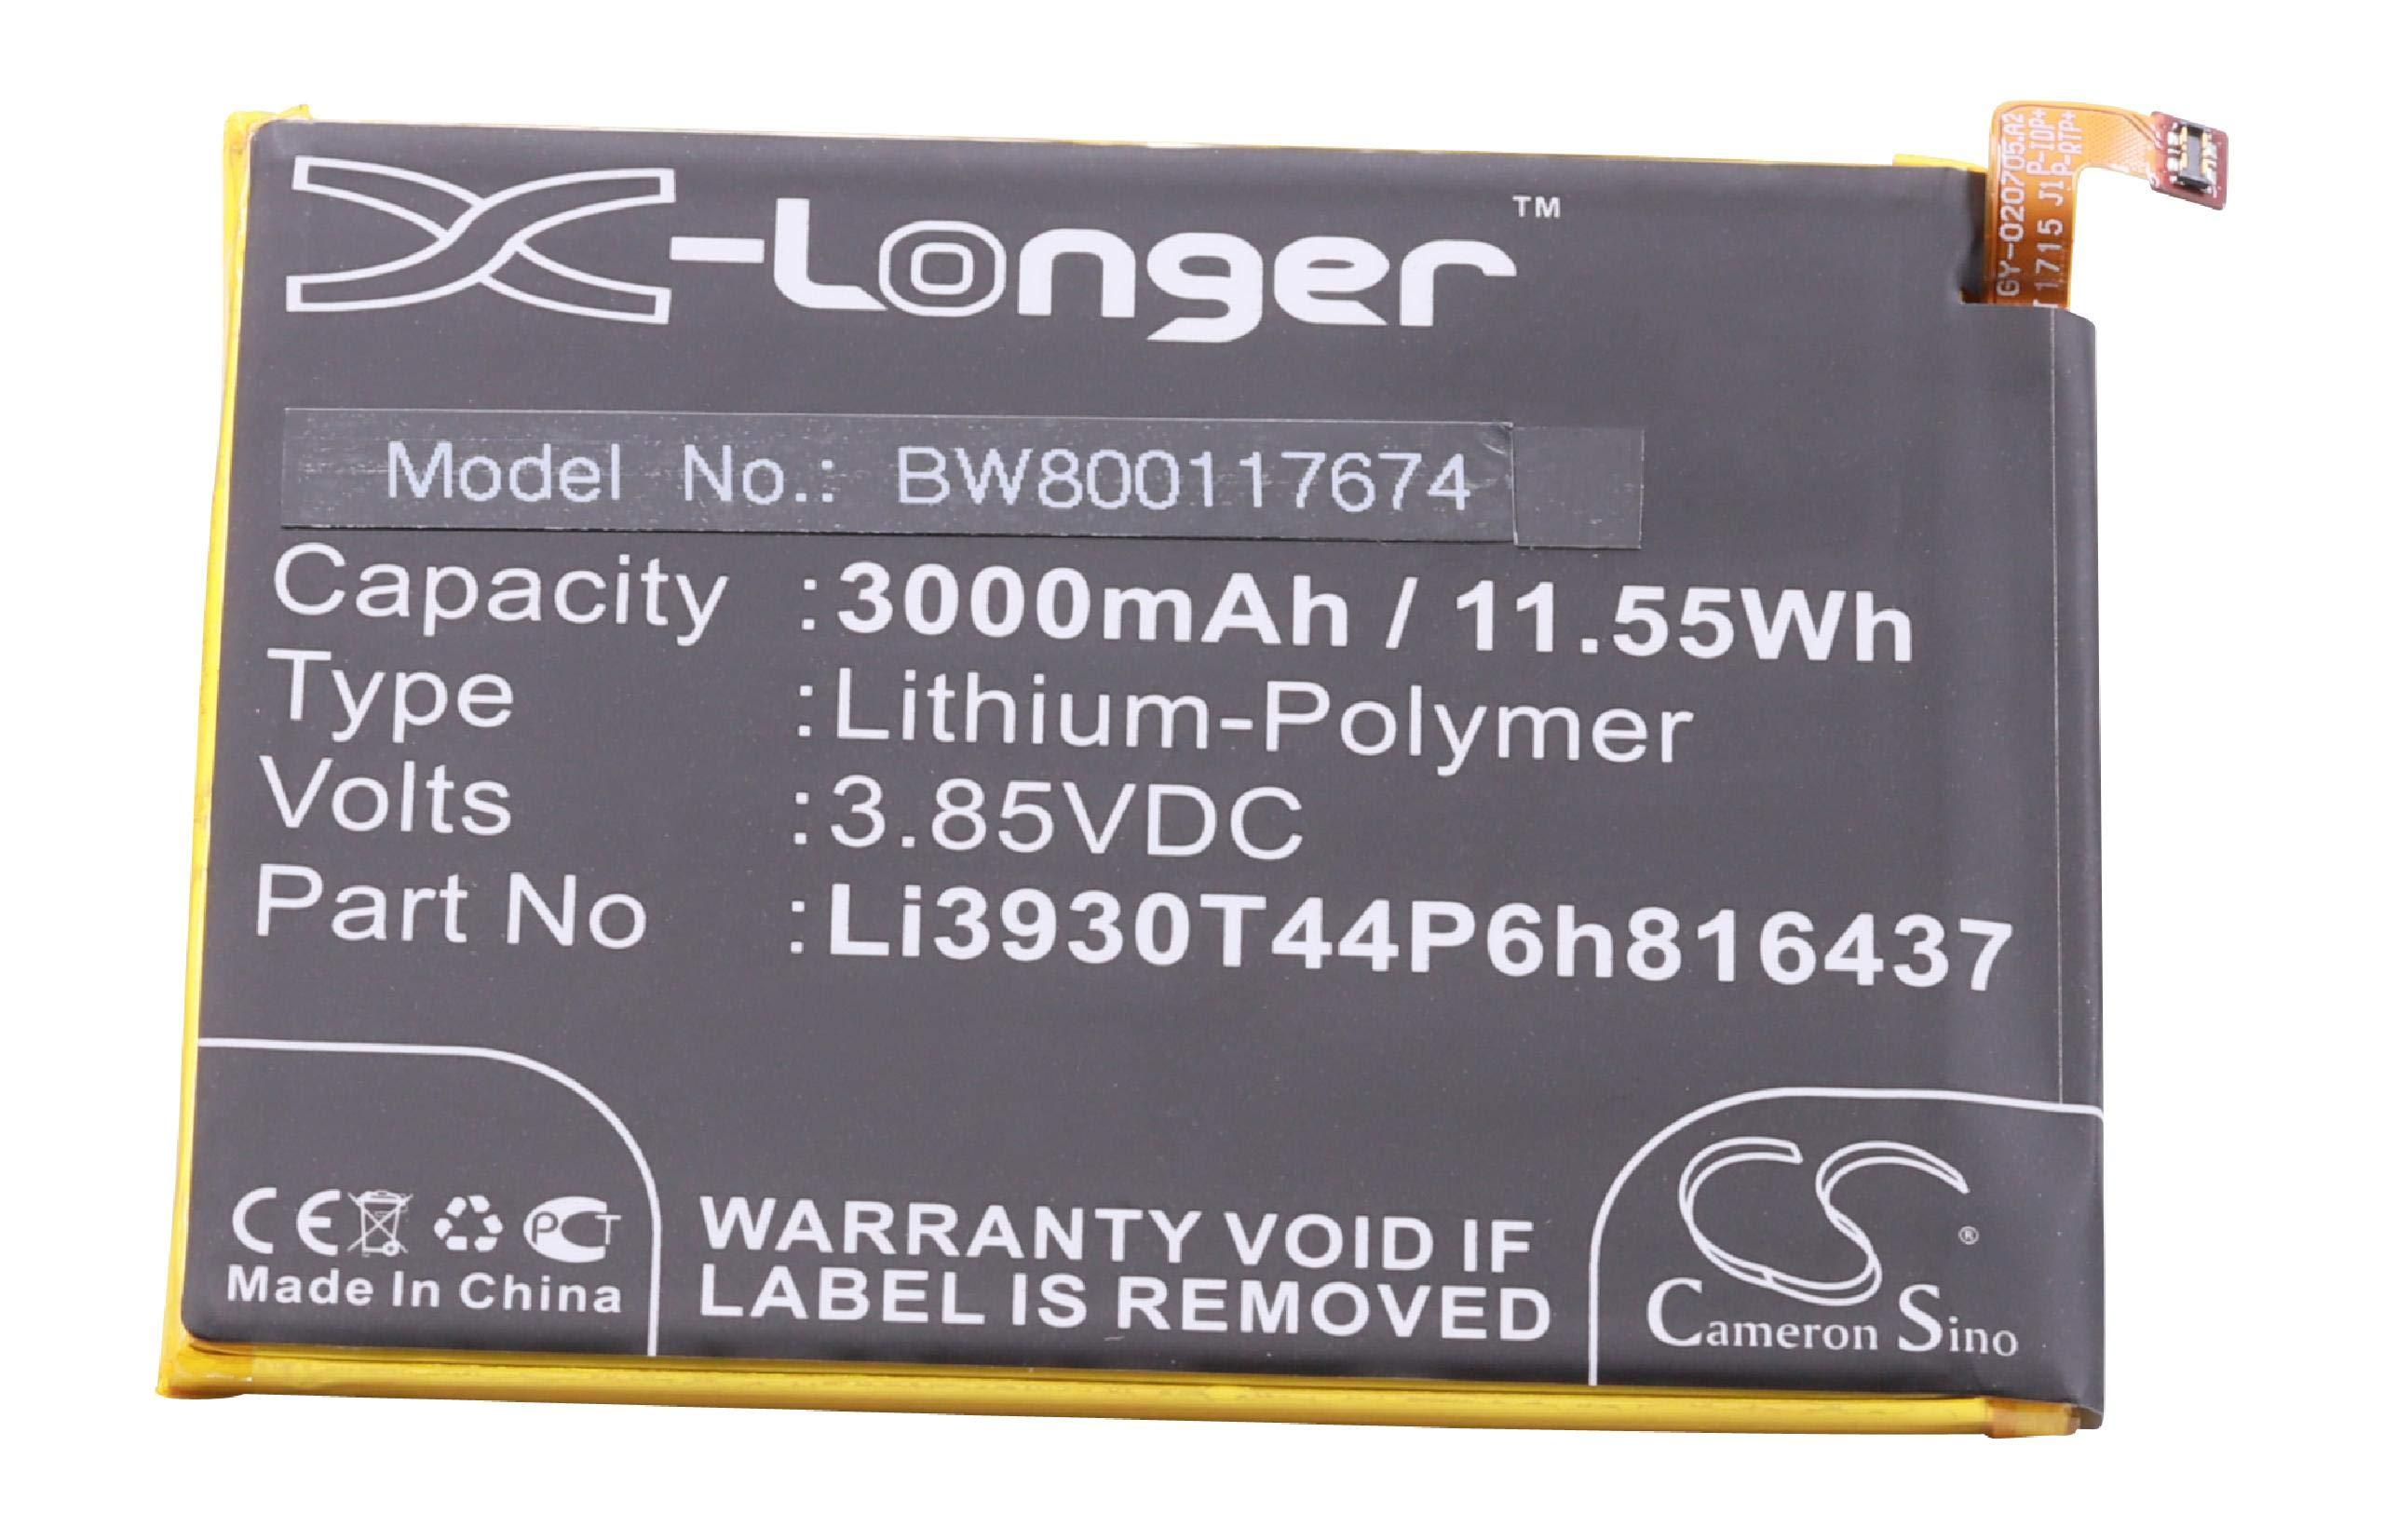 vhbw Litio polímero batería 3000mAh (3.85V) para móvil Smartphone teléfono Vodafone Smart V8, VFD 710, VFone 6+: Amazon.es: Electrónica